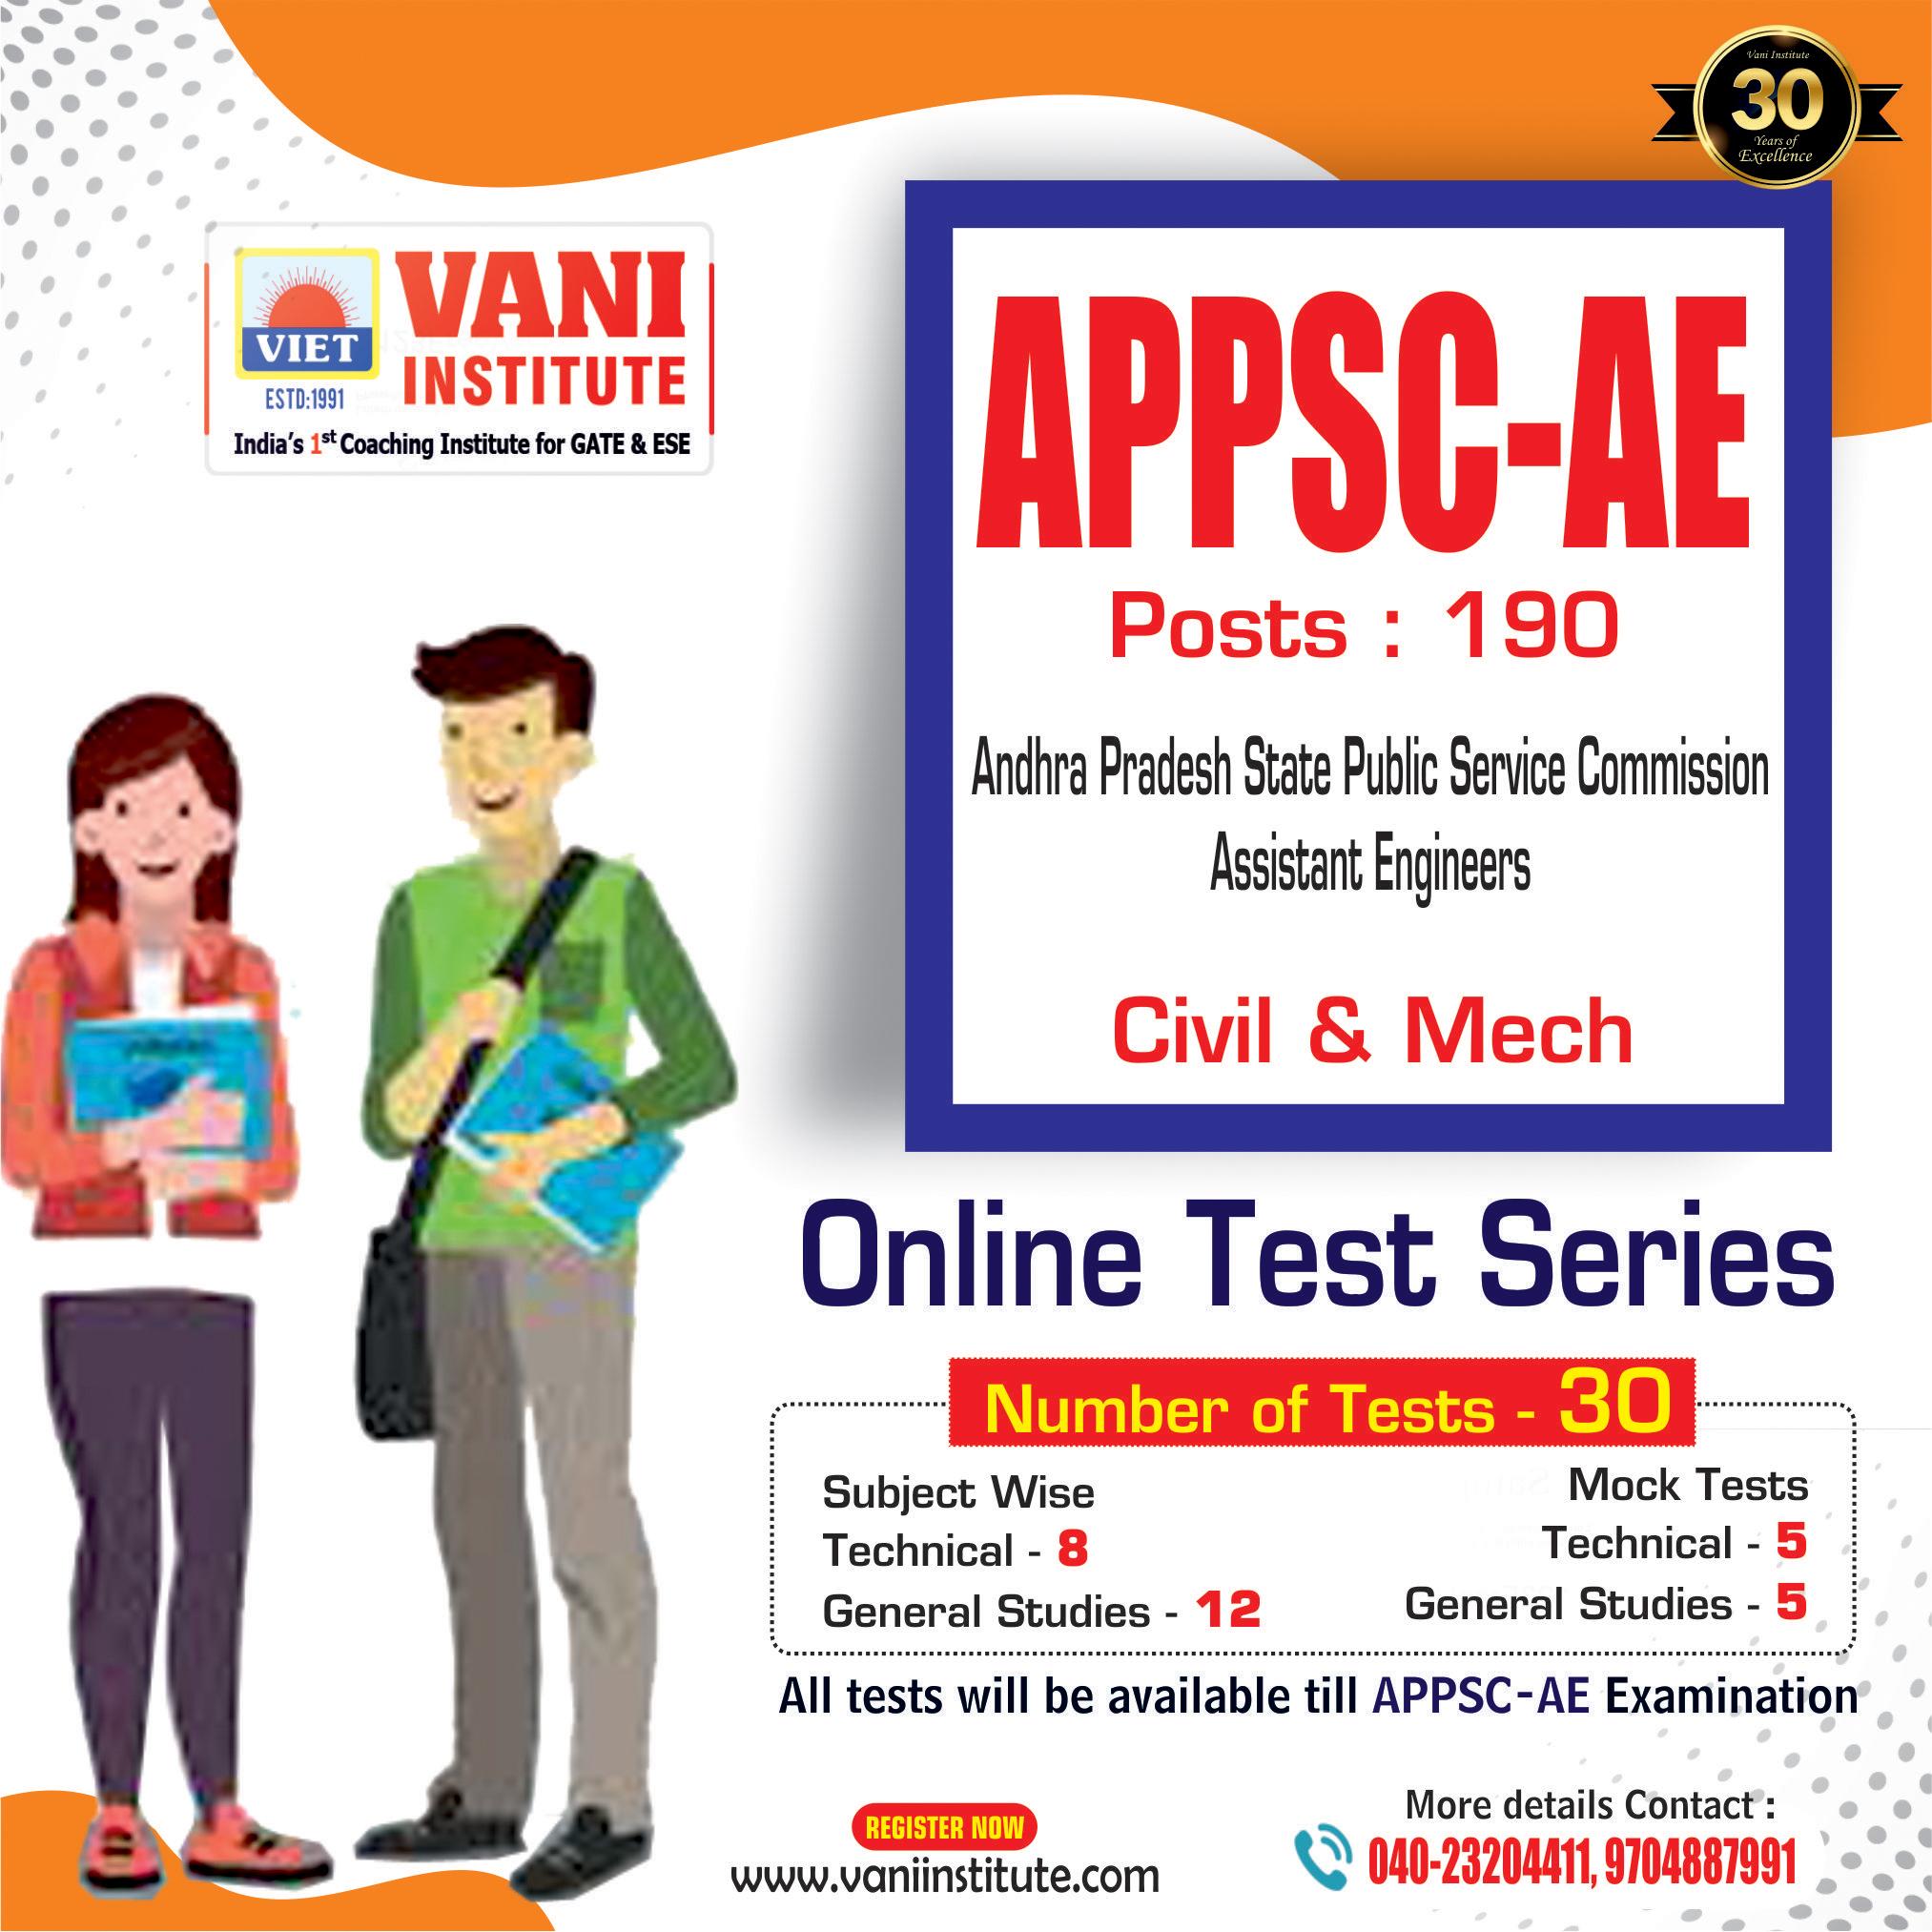 APPSC-AE ONLINE TEST SERIES